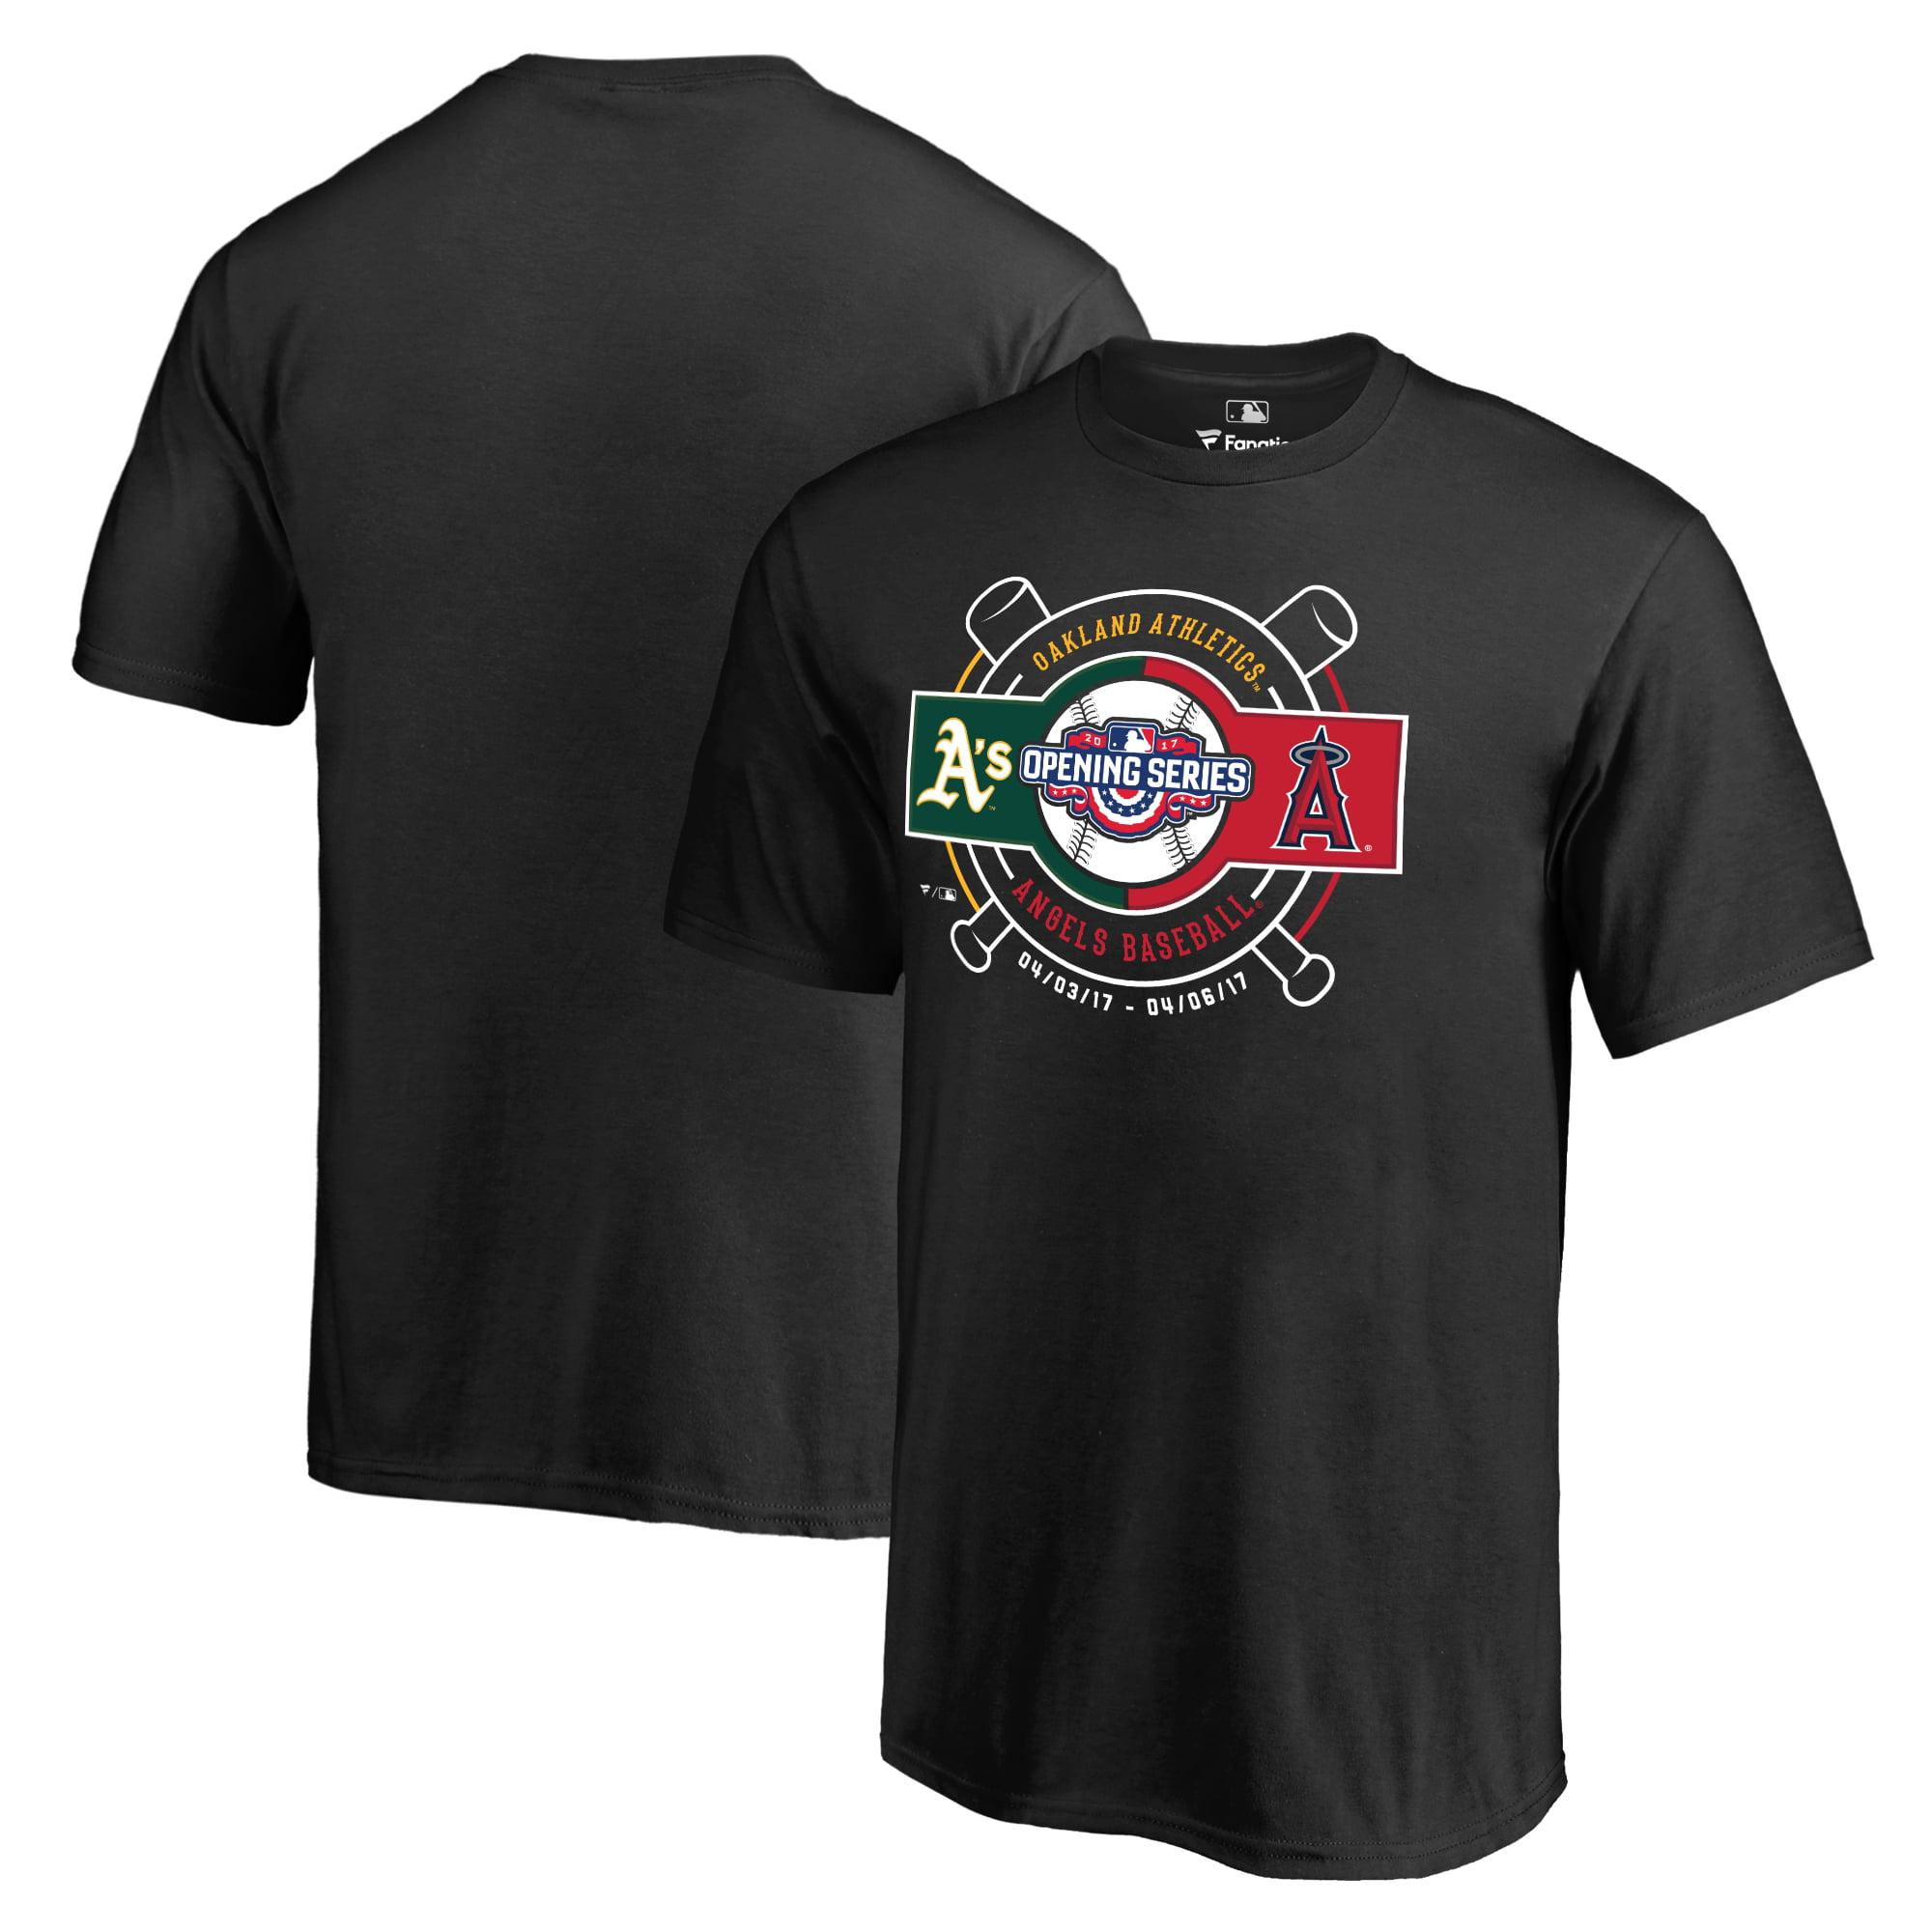 Oakland Athletics vs. Los Angeles Angels Fanatics Branded Youth 2017 Opening Series T-Shirt - Black